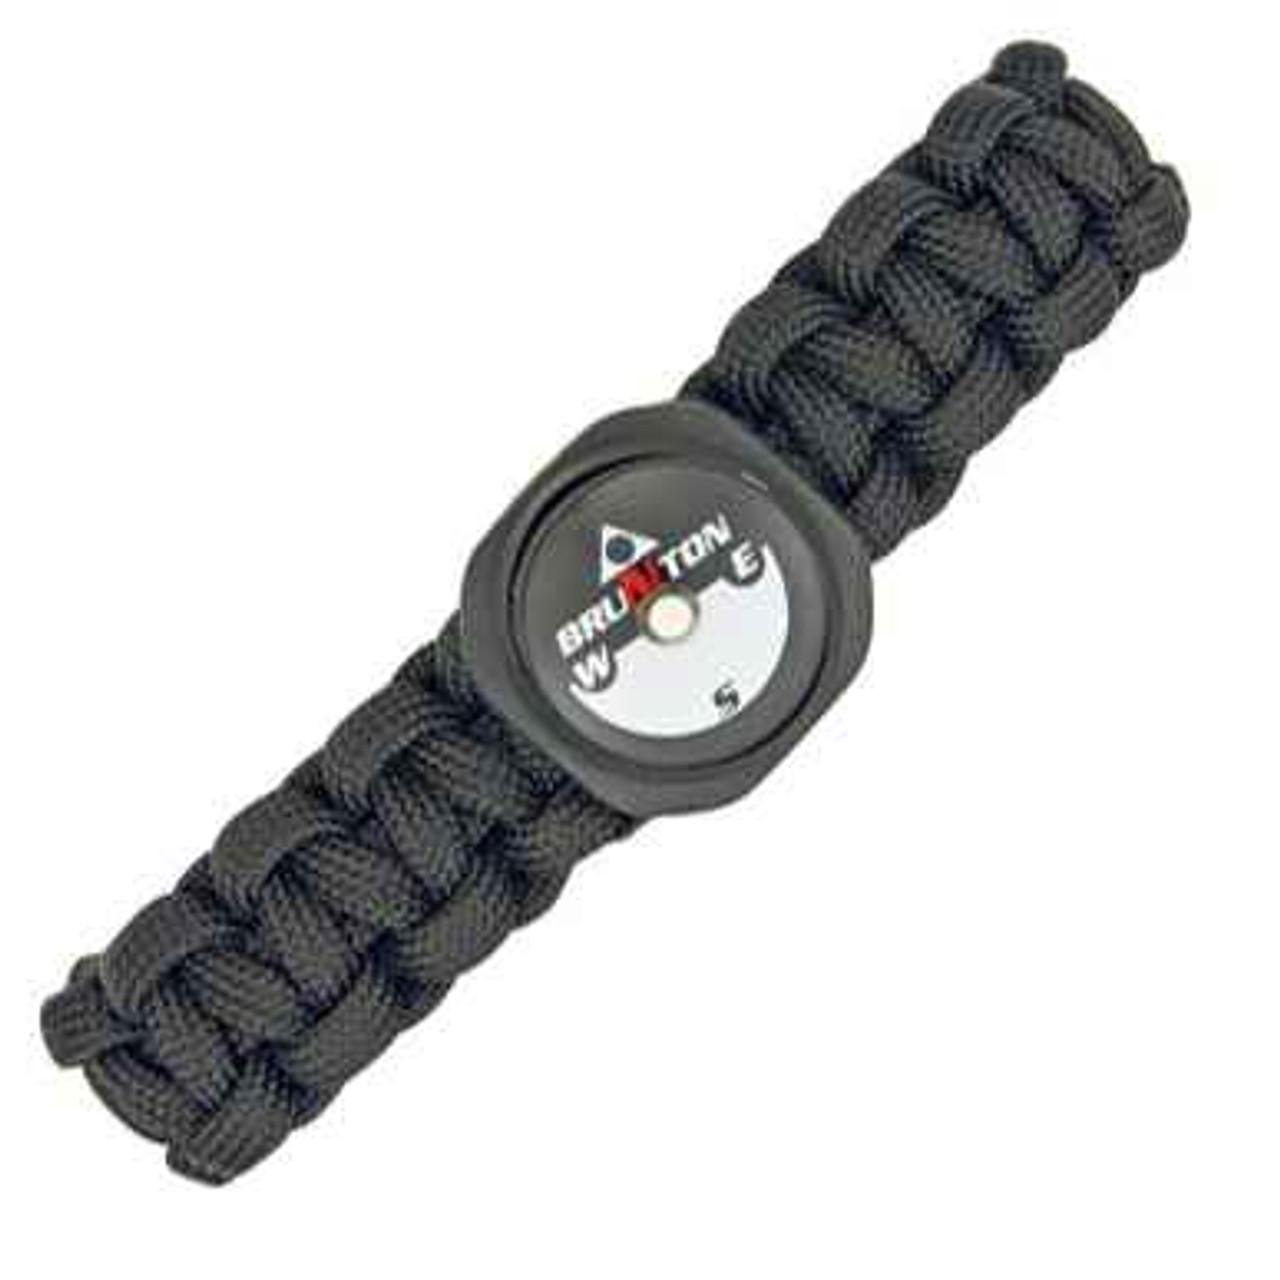 Para Cord Survival Bracelet with Compass. Black Size Medium